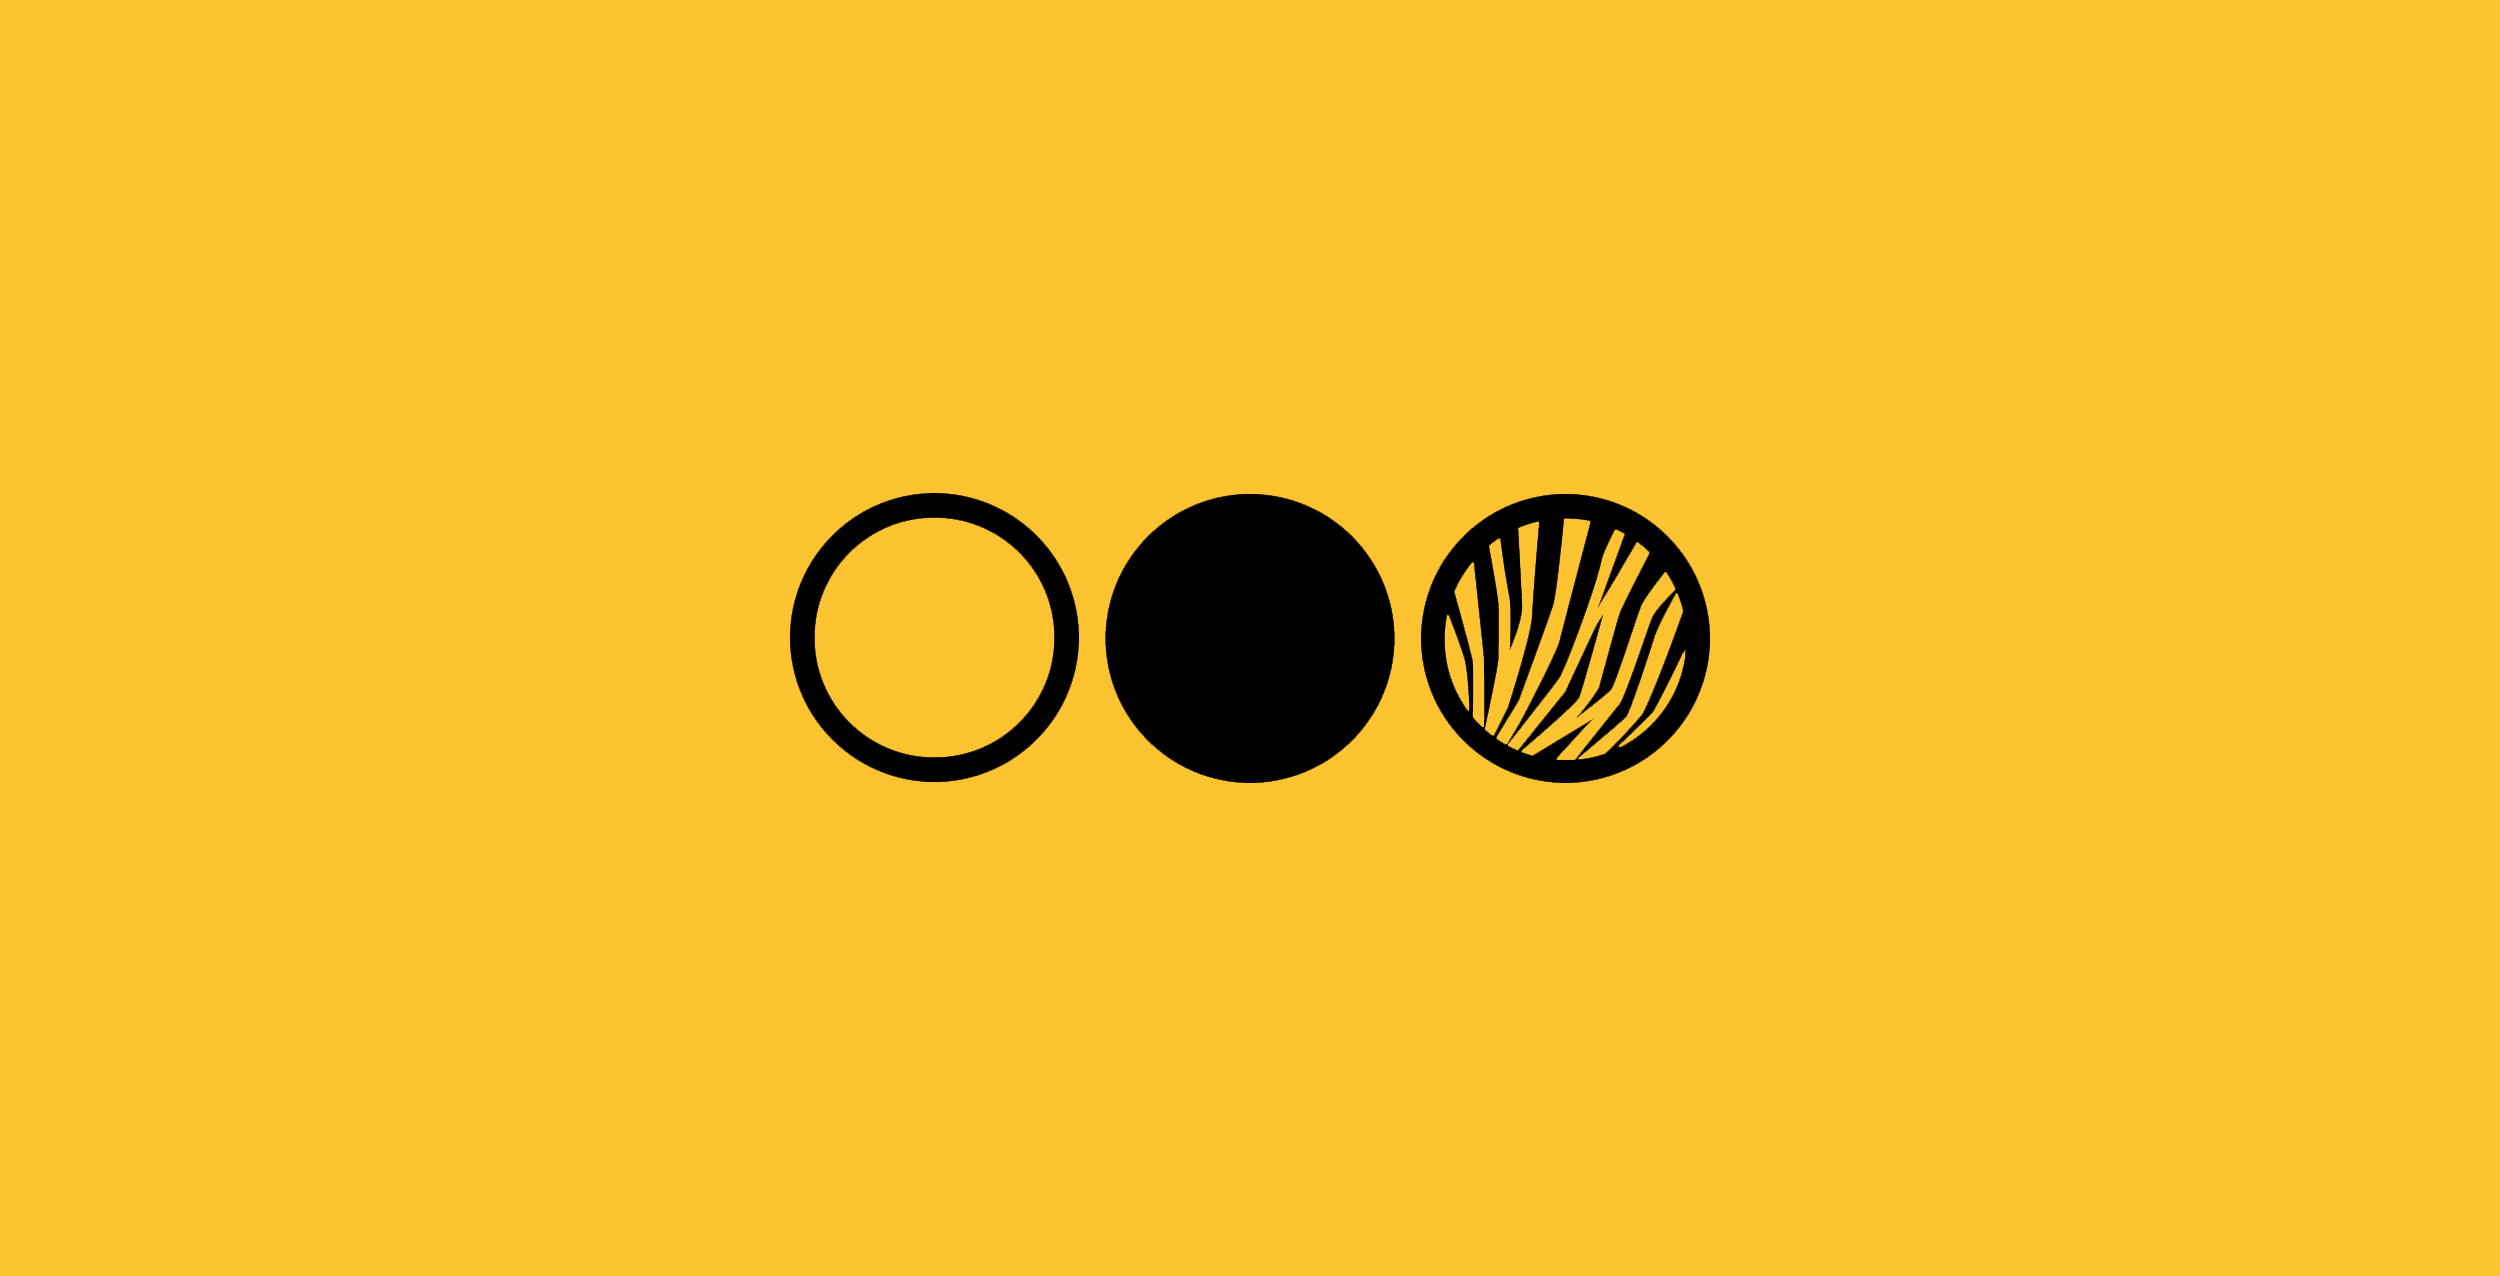 logo002.jpg